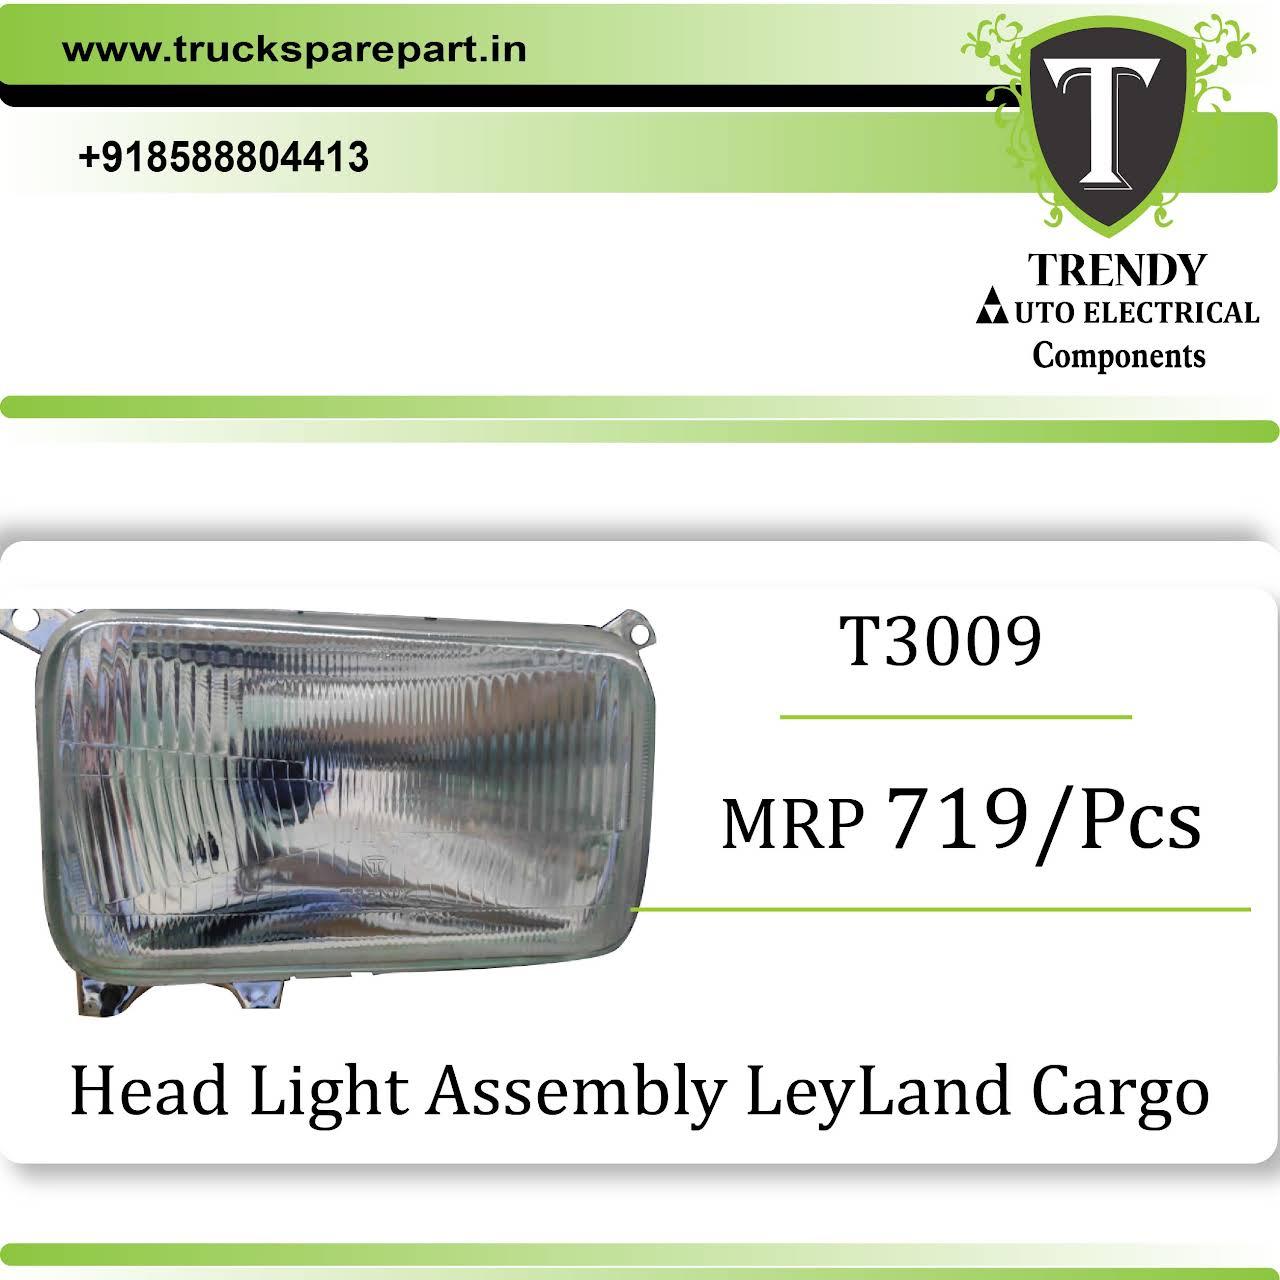 Wonderlijk TRENDY truck parts - Delhi Based Automobile Spare Parts Exporters DX-09